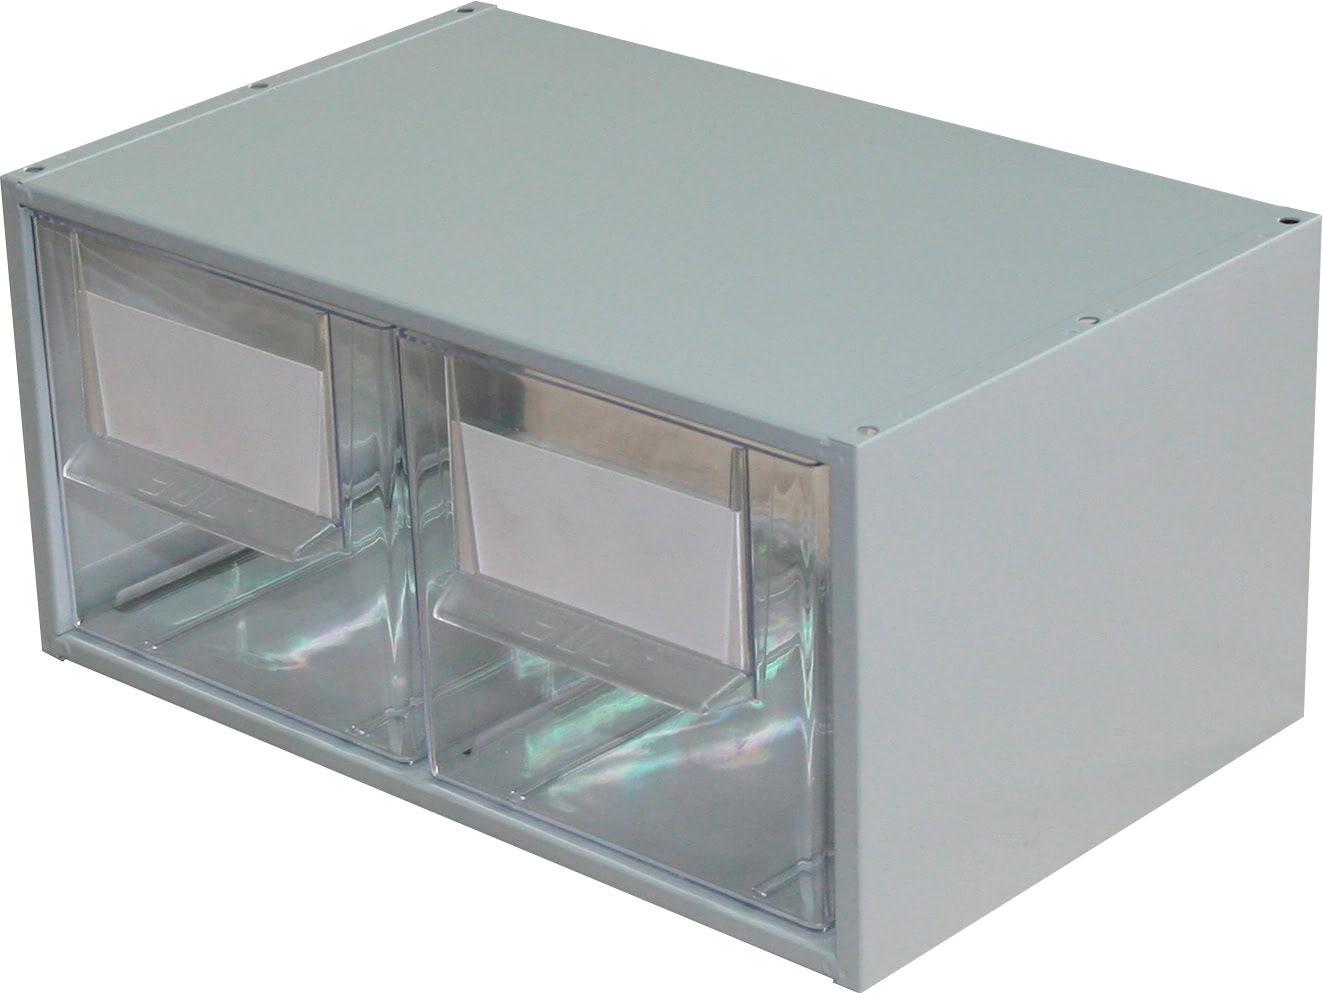 Estante Metálo-Plástica com 2 gavetas n.º 3 SUC